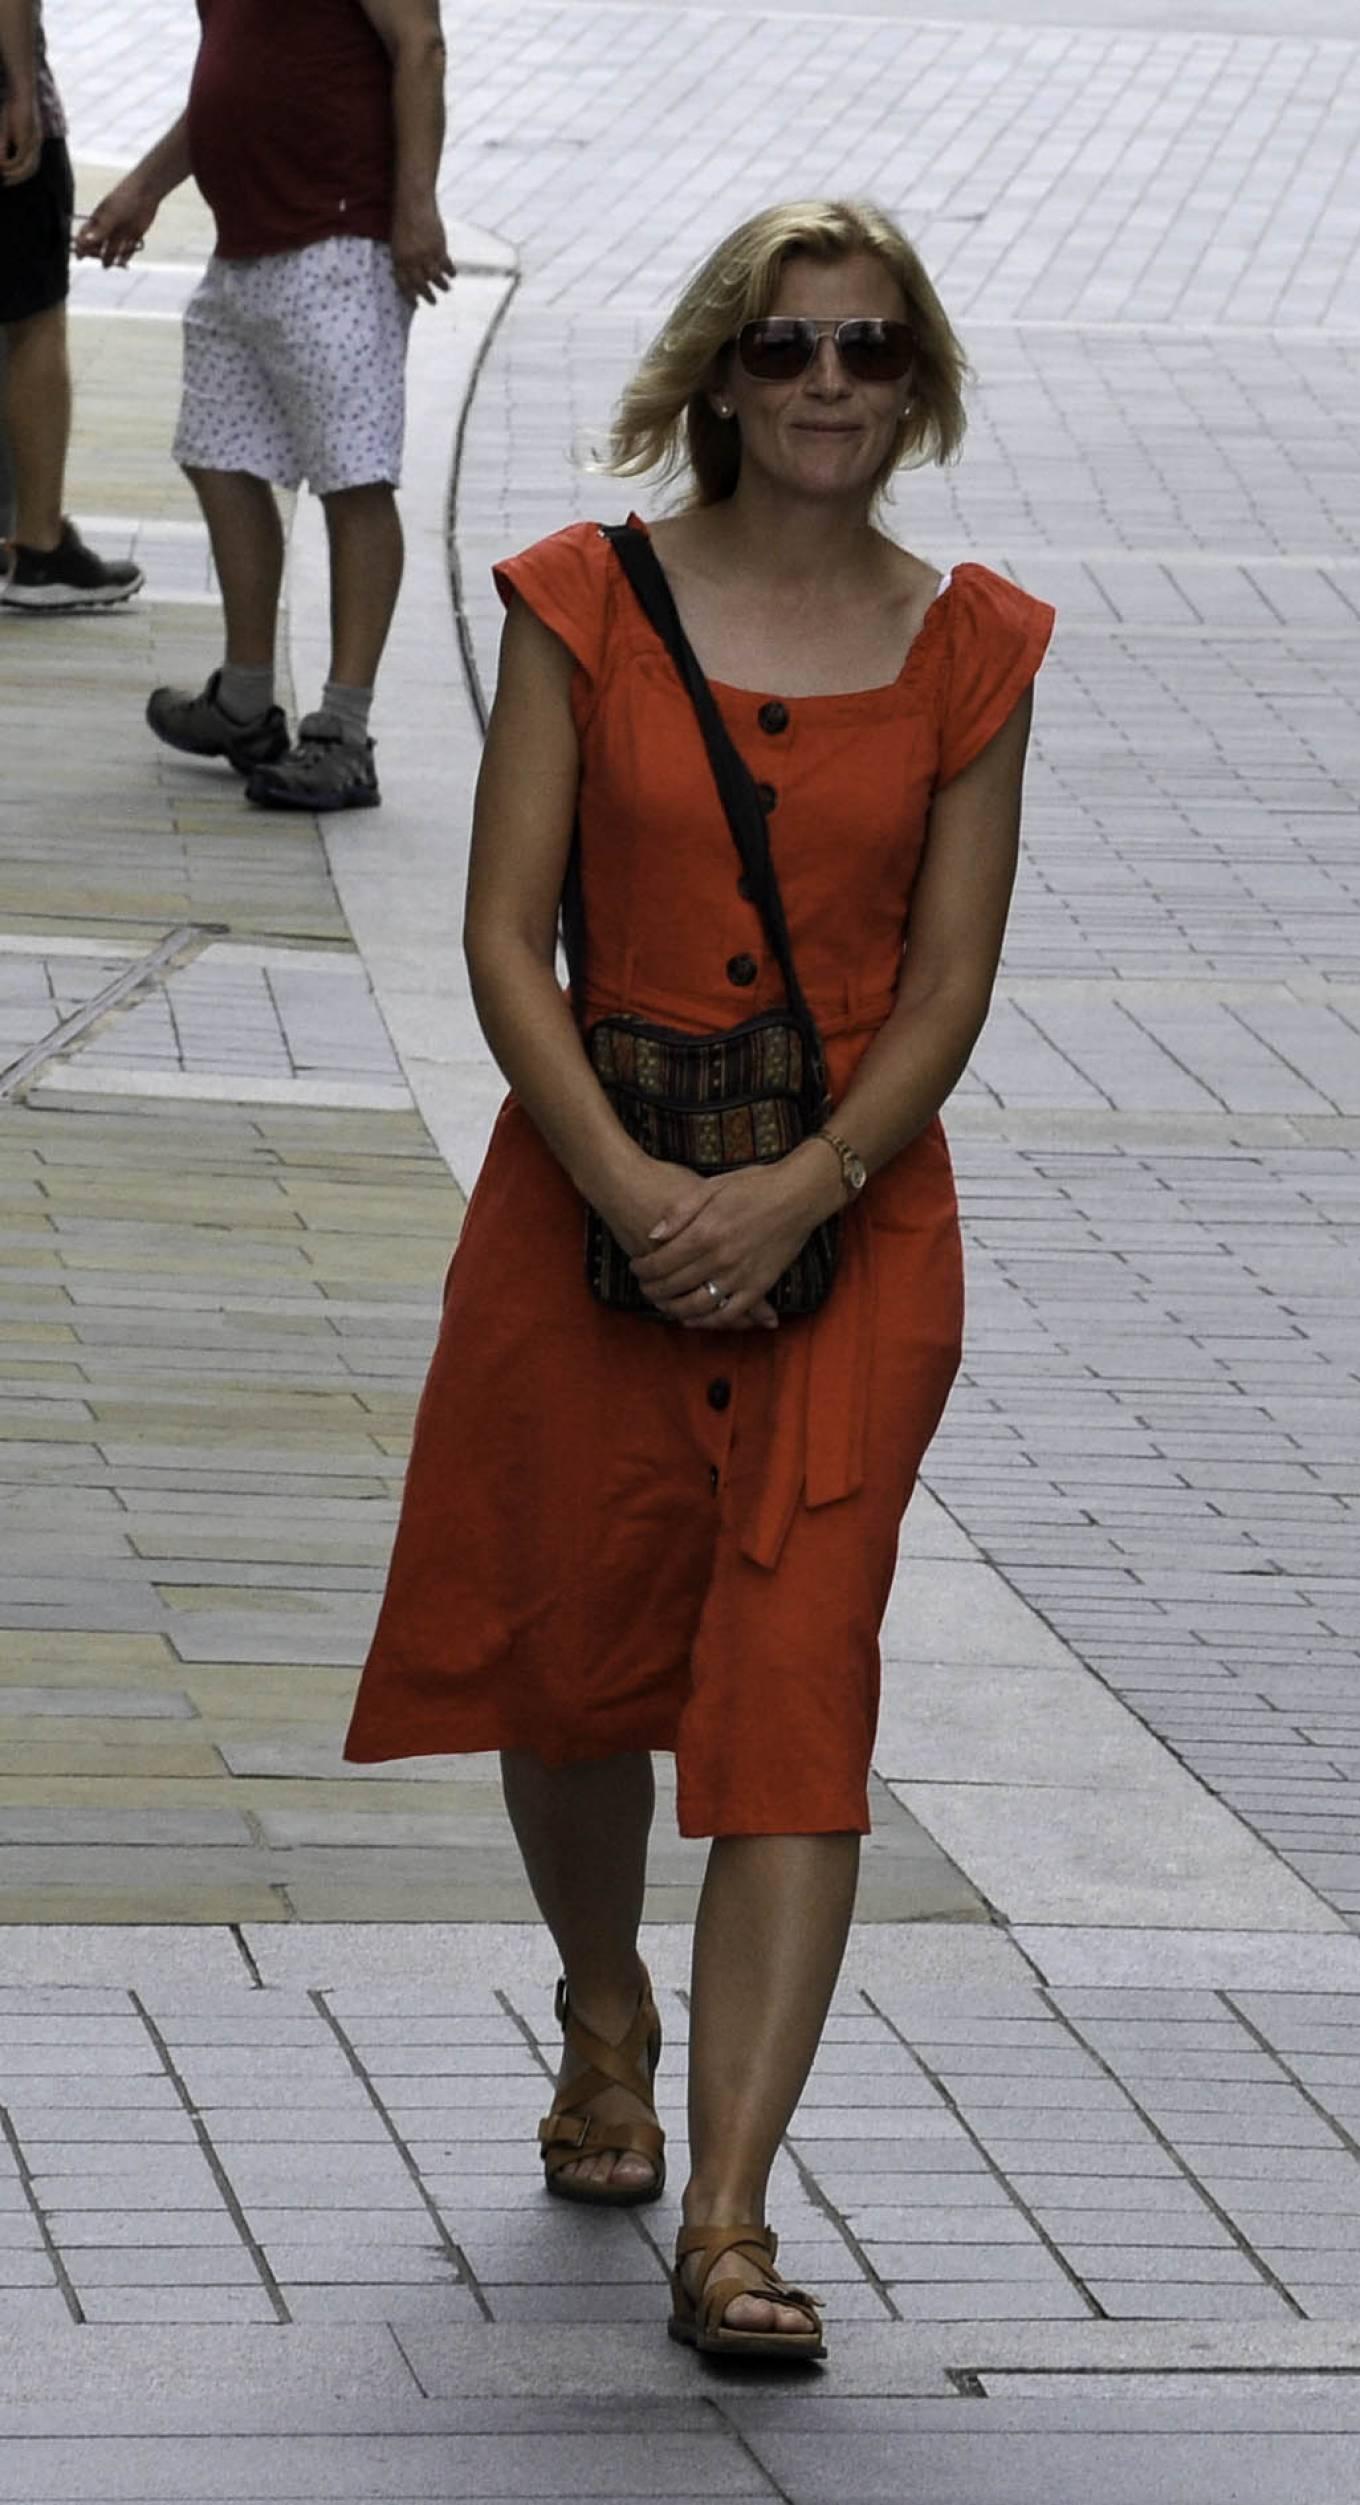 Jane Danson - Seen on Mediacity in Salford Quays Manchester